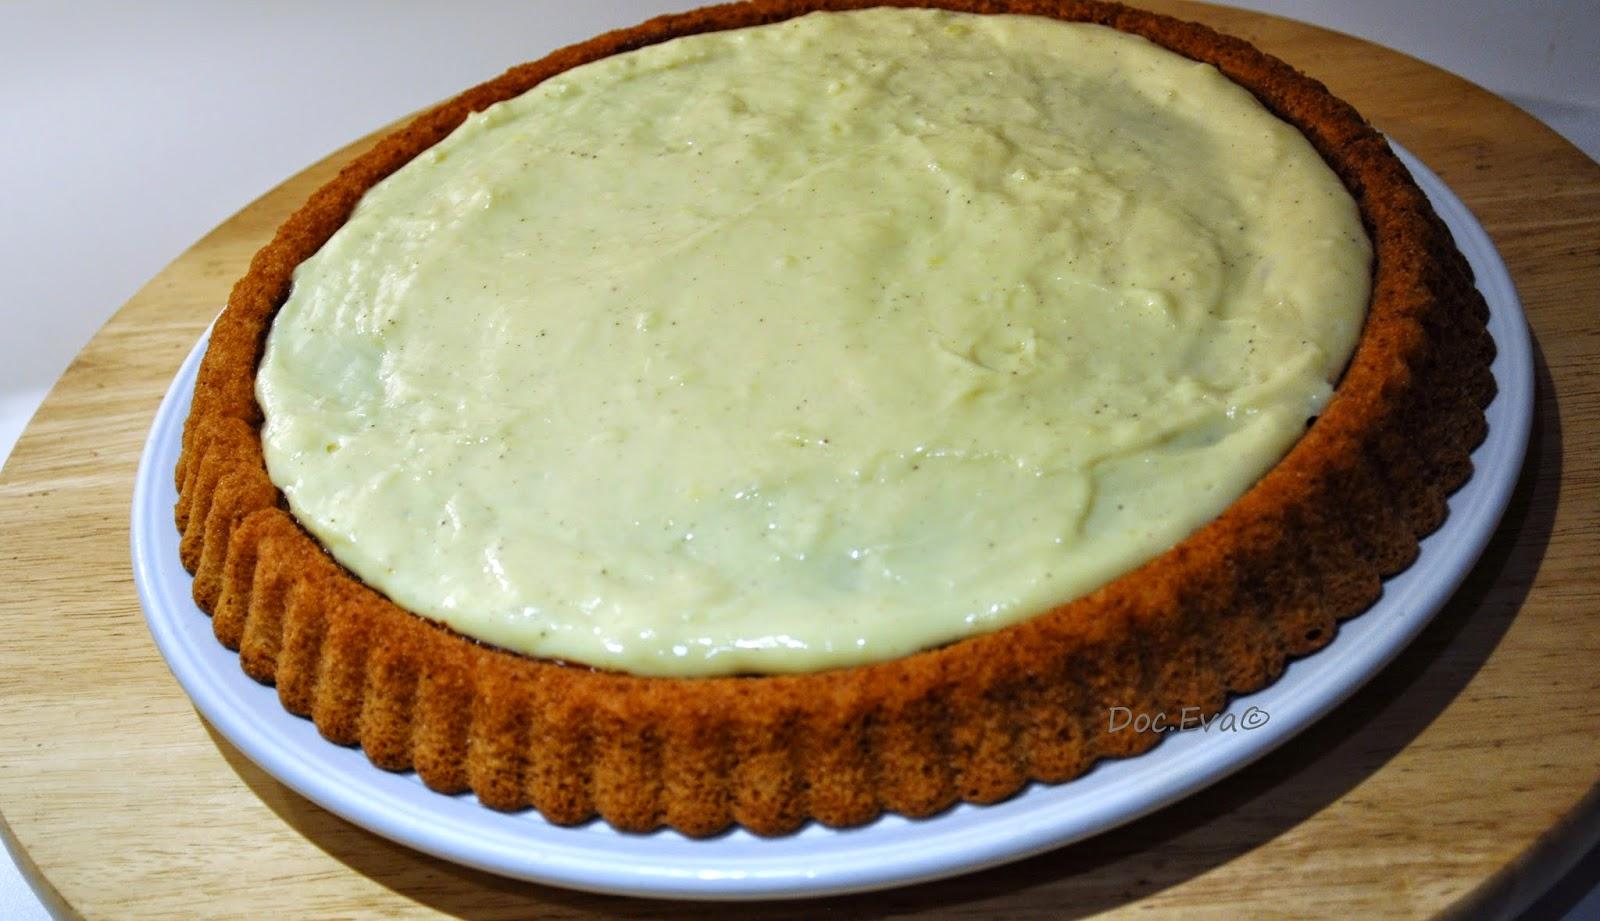 Pudding, eifrei